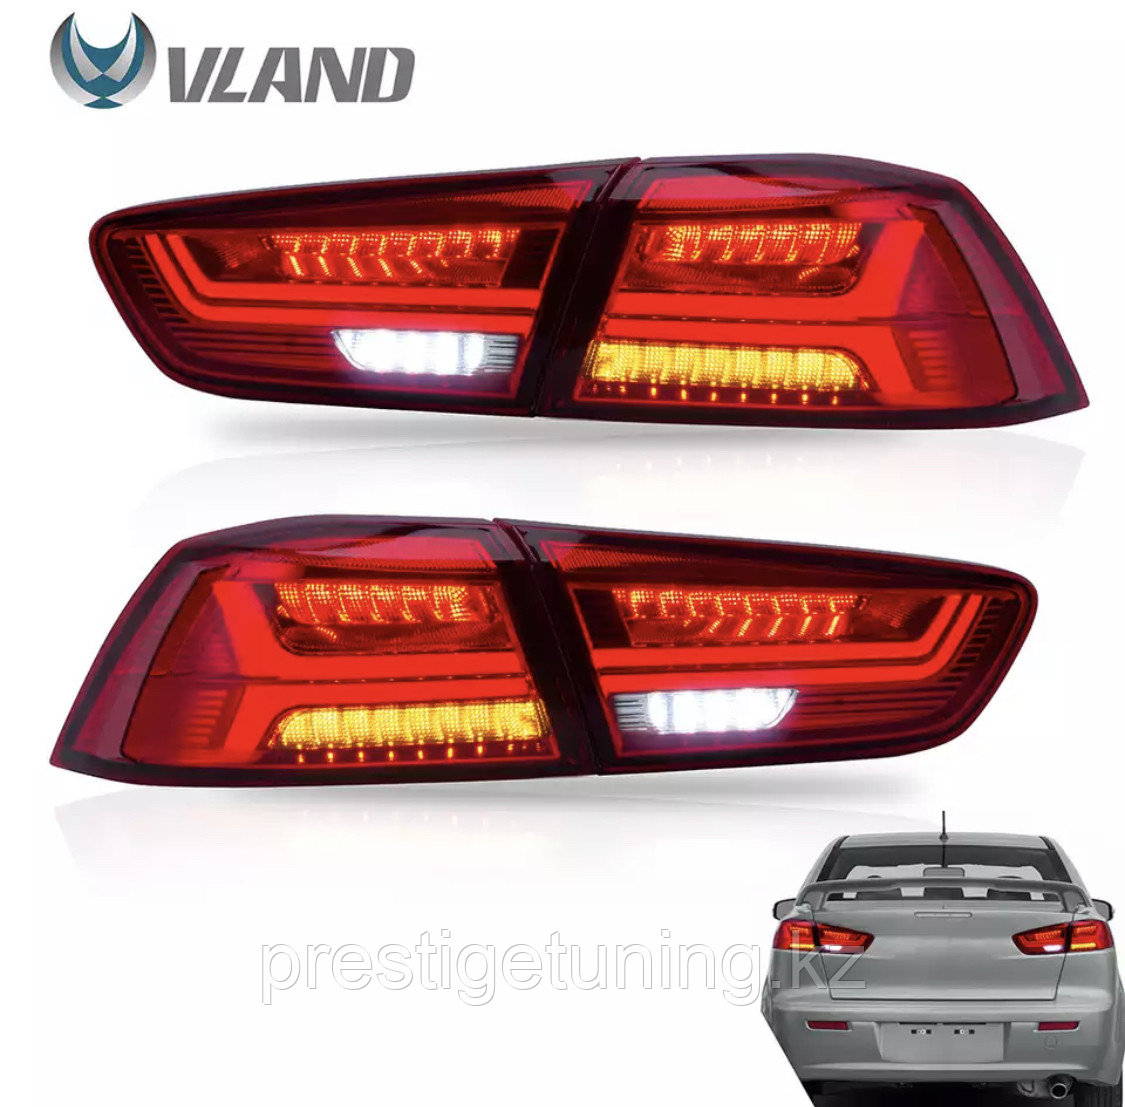 Задние фонари Mitsubishi Lancer Audi style Red Color 2008 -2019